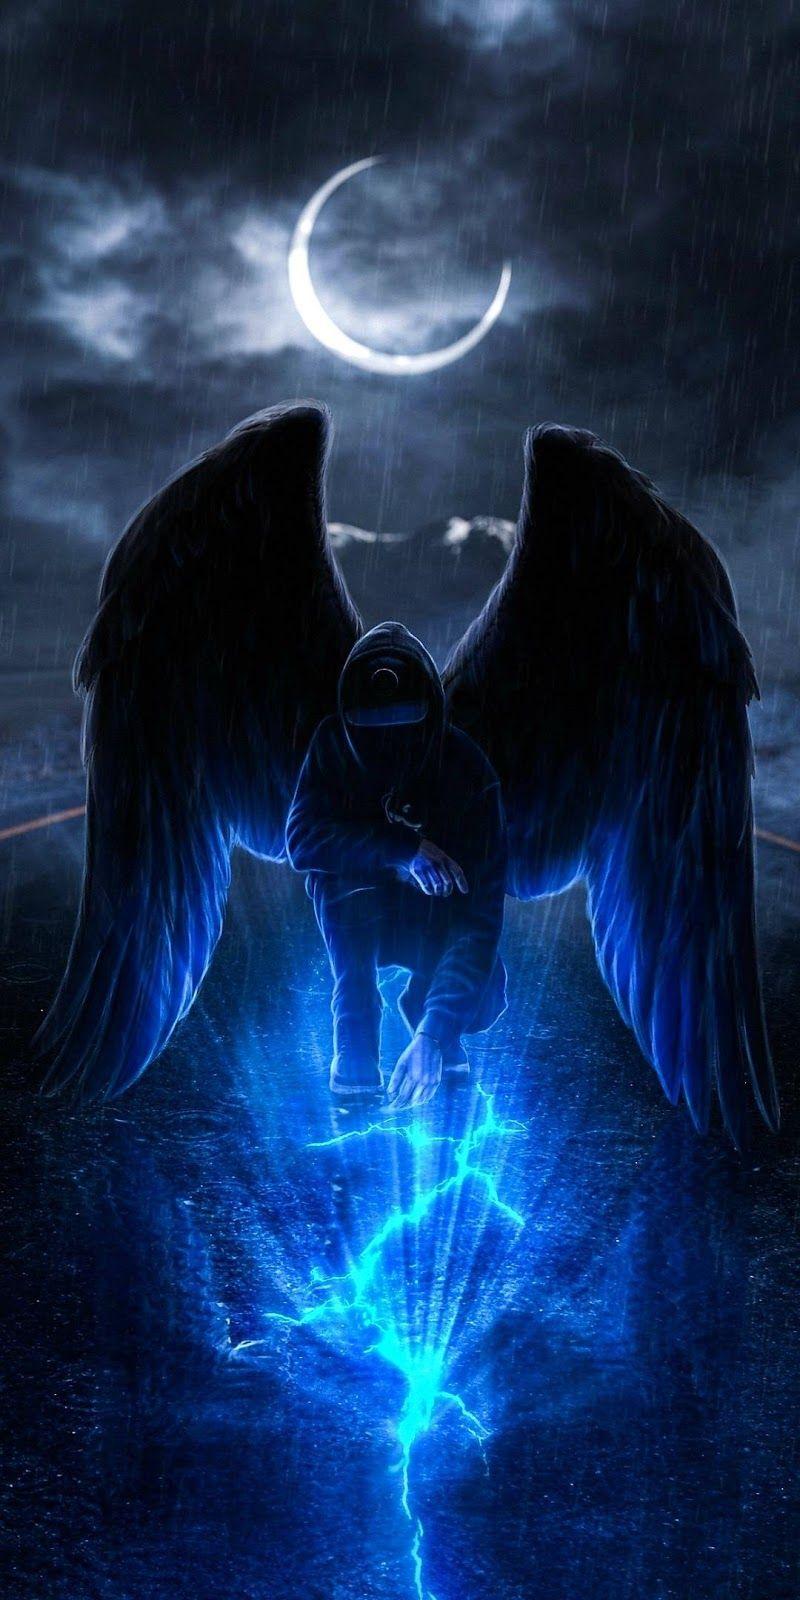 Dark Angel In 2020 Angel Wallpaper Hypebeast Wallpaper Neon